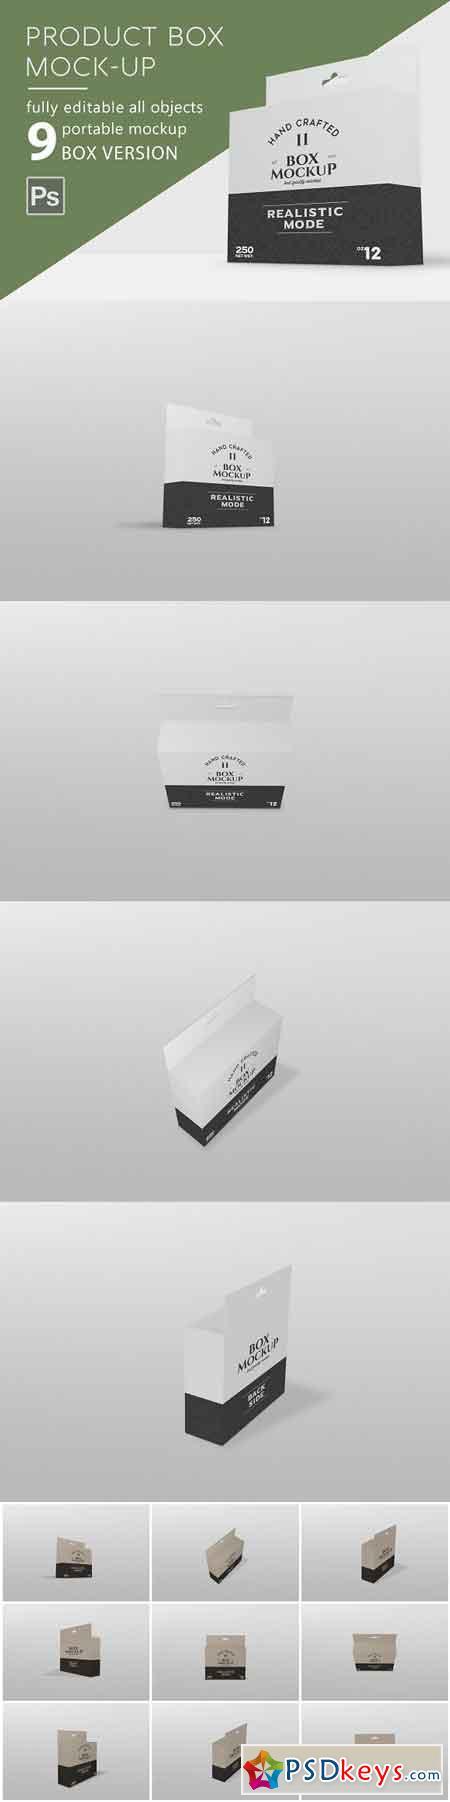 Branding Box Mockup 2944354